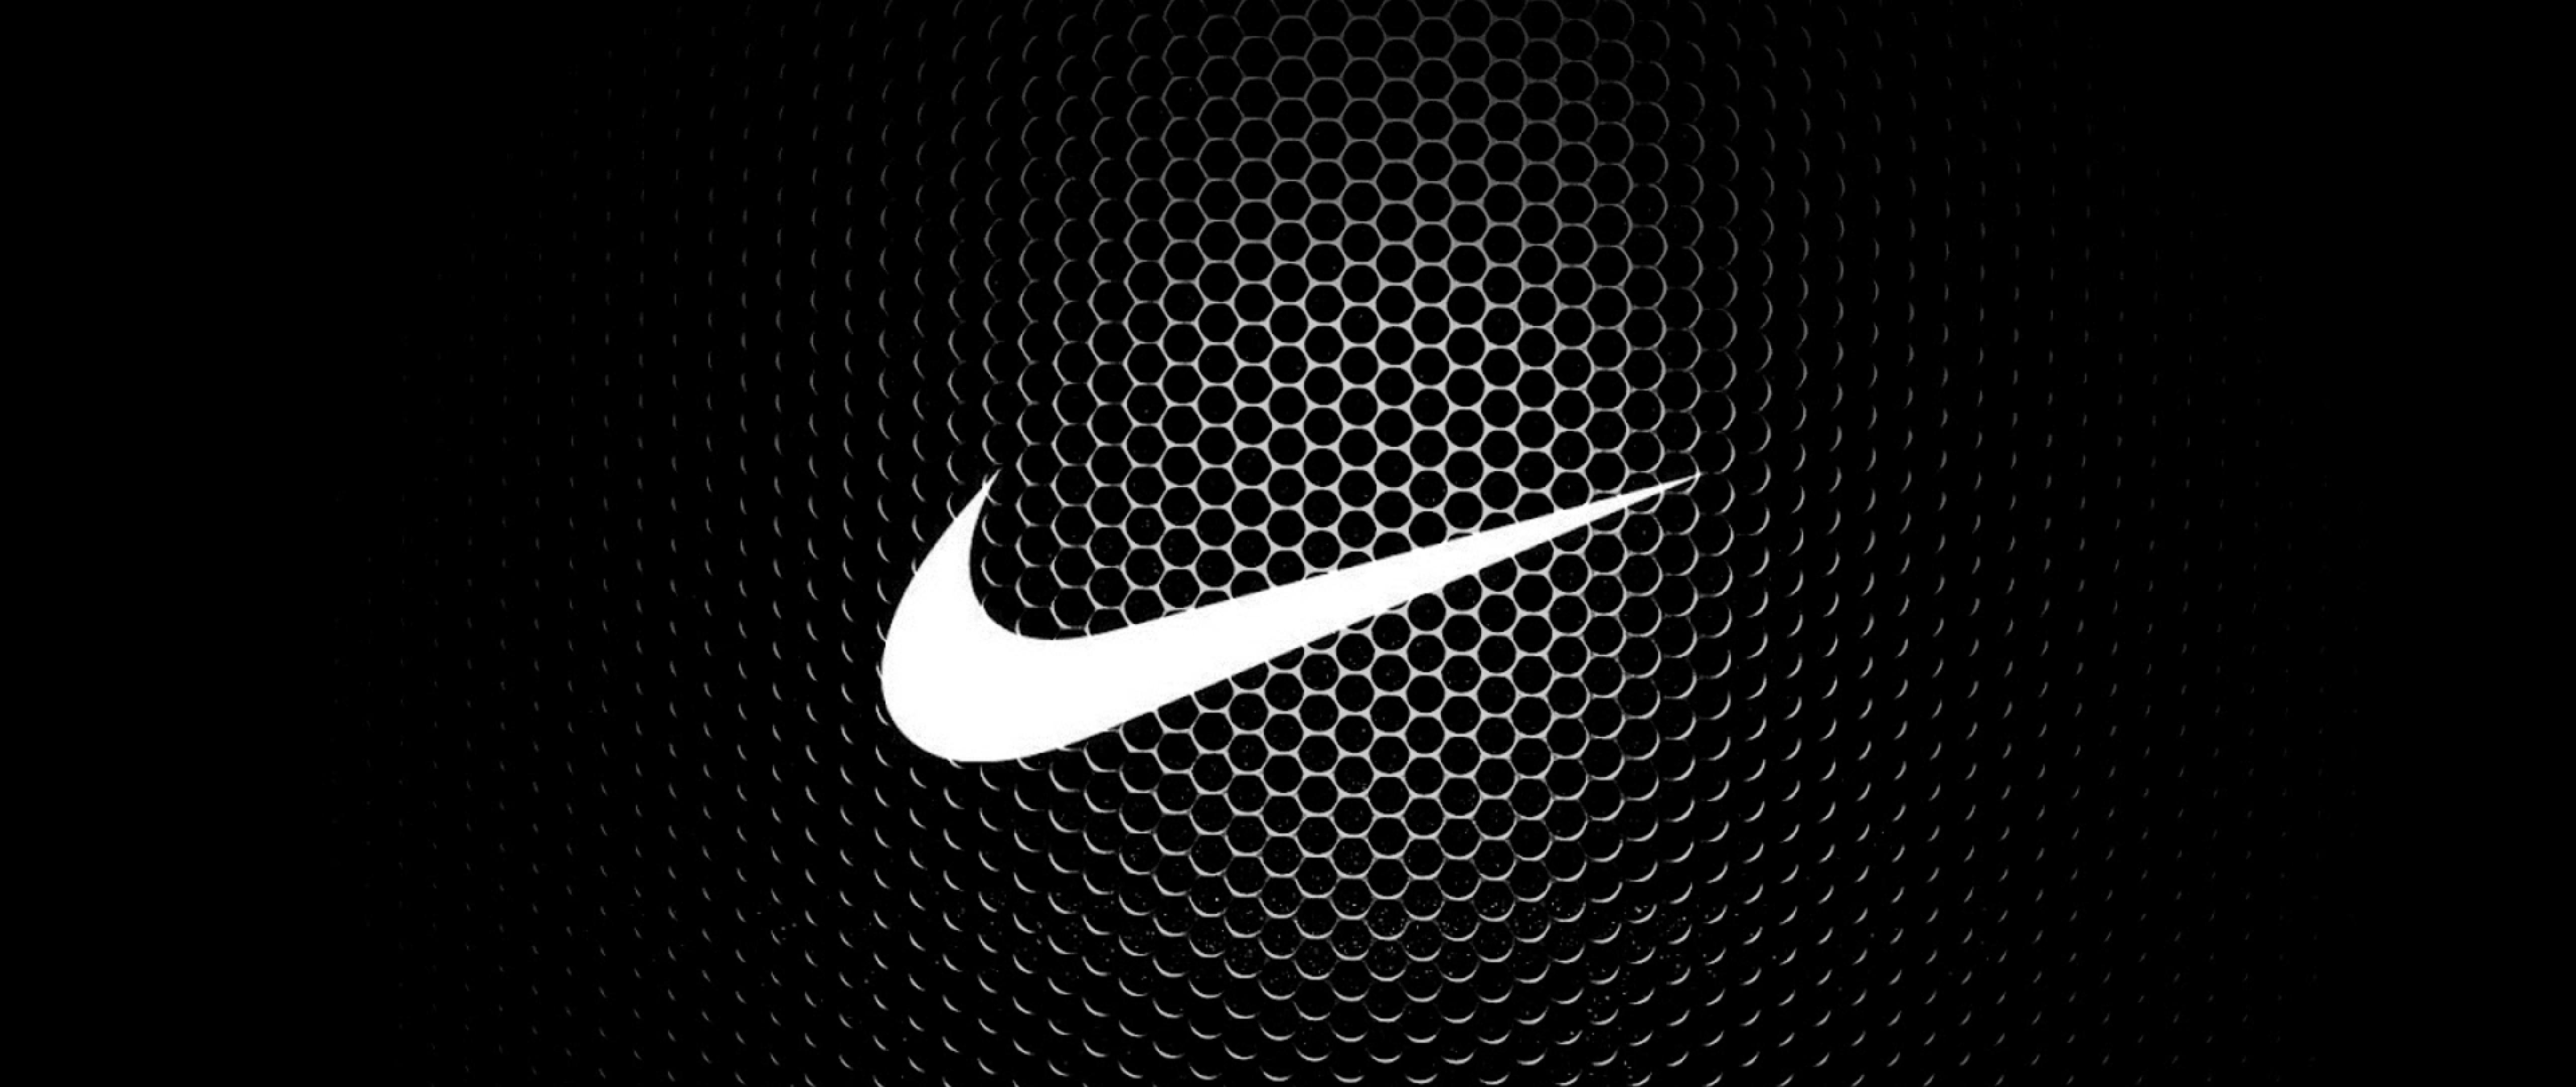 Cool Nike Logo High Resolution Full Hd Background ...